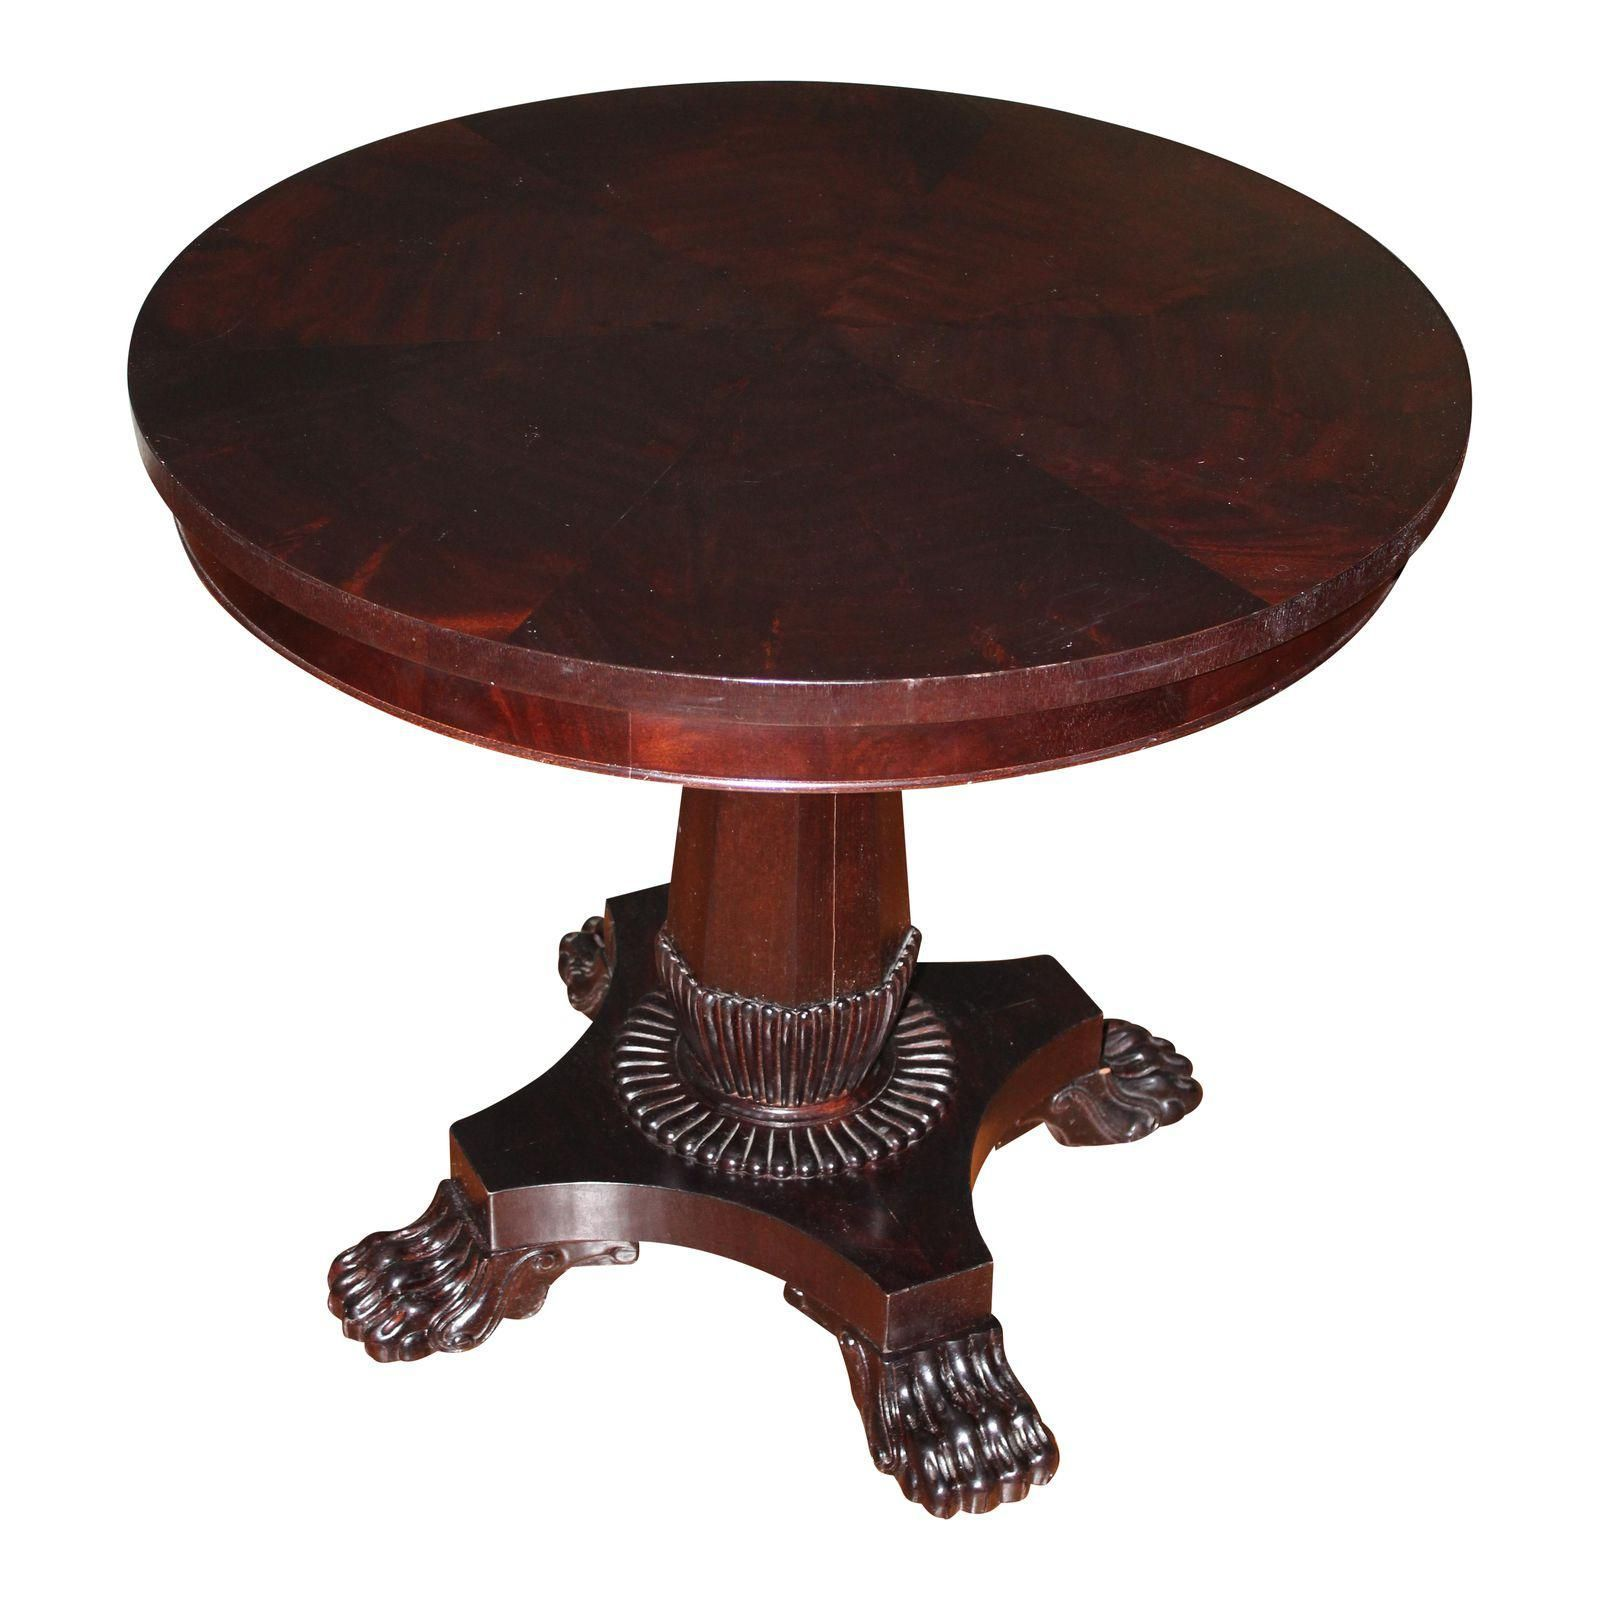 Henredon Asian Coffee Table Asian Coffee Table Cool Coffee Tables Coffee Tables For Sale [ 1600 x 1600 Pixel ]